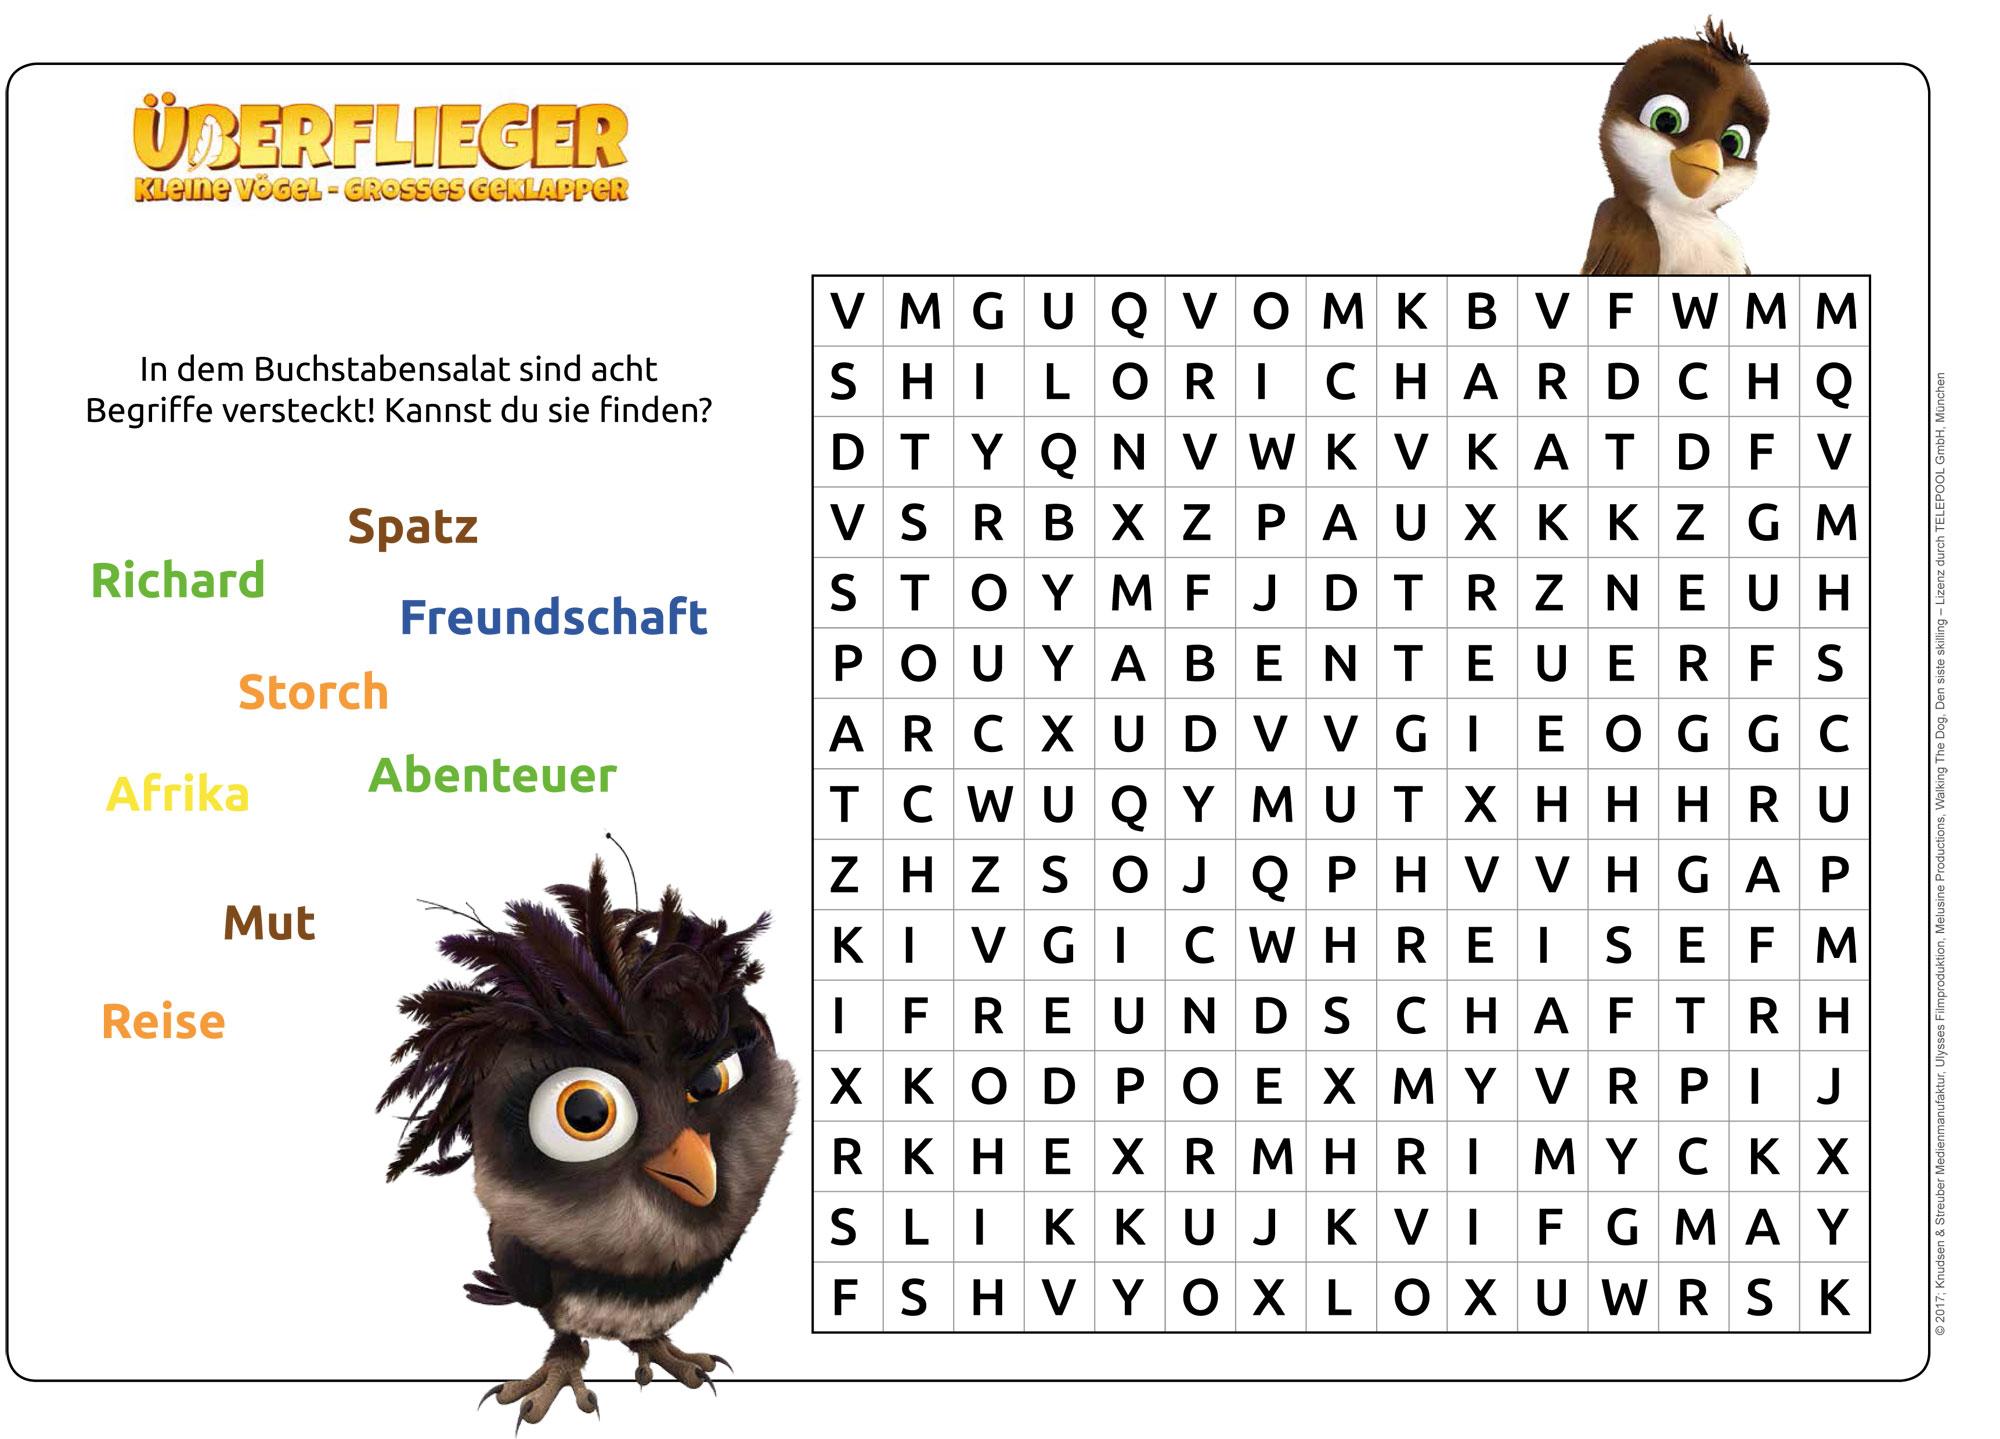 Ausmalbild Bilderkreuzworträtsel und Sudoku: Buchstabensalat ...